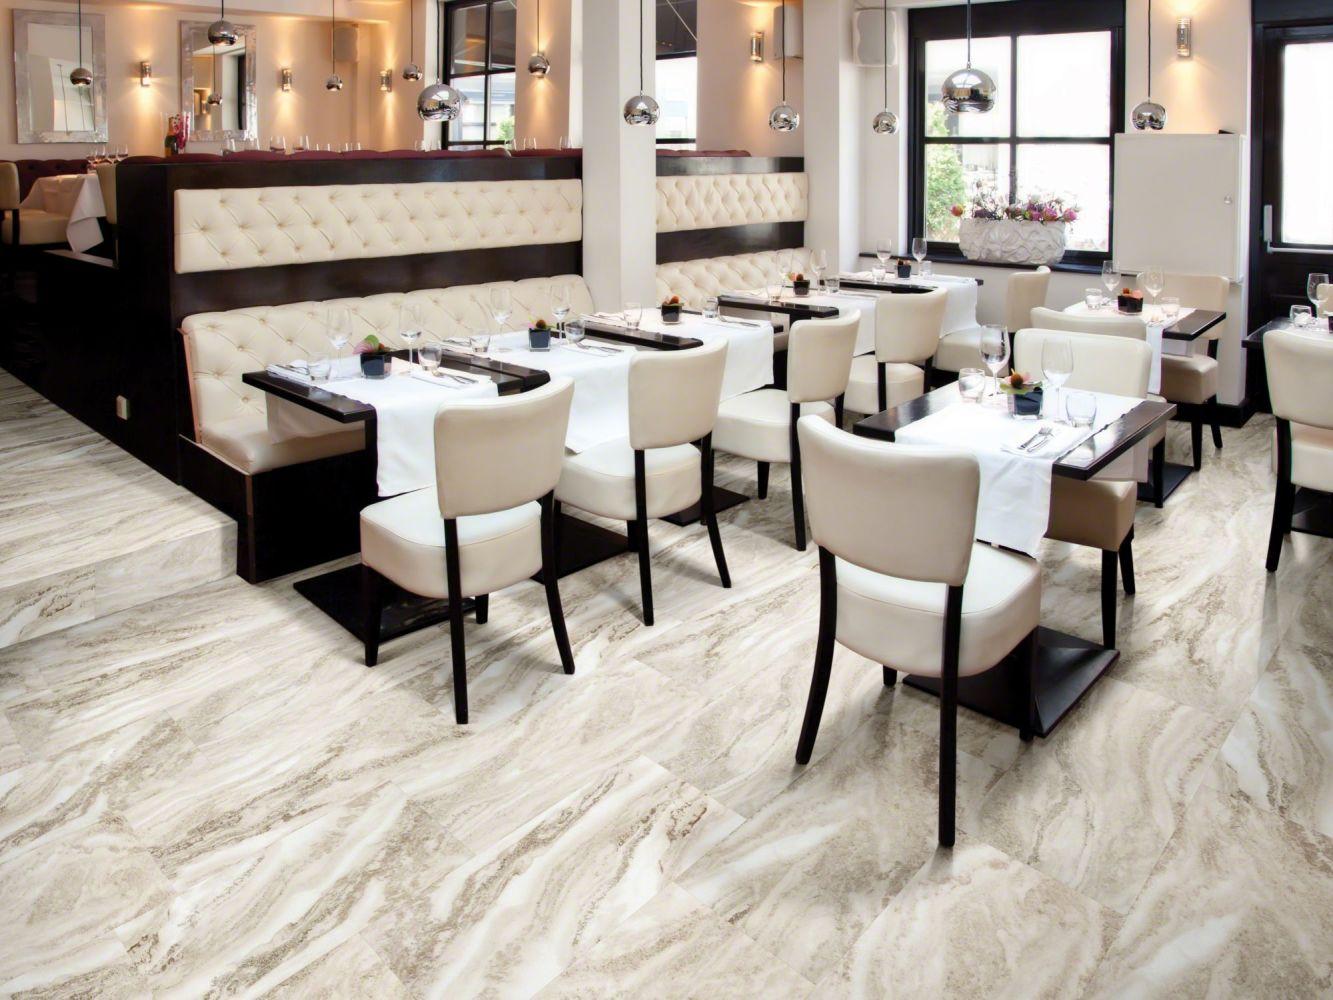 Shaw Floors 5th And Main Ocean Avenue Elite Carmelo 00239_5M201